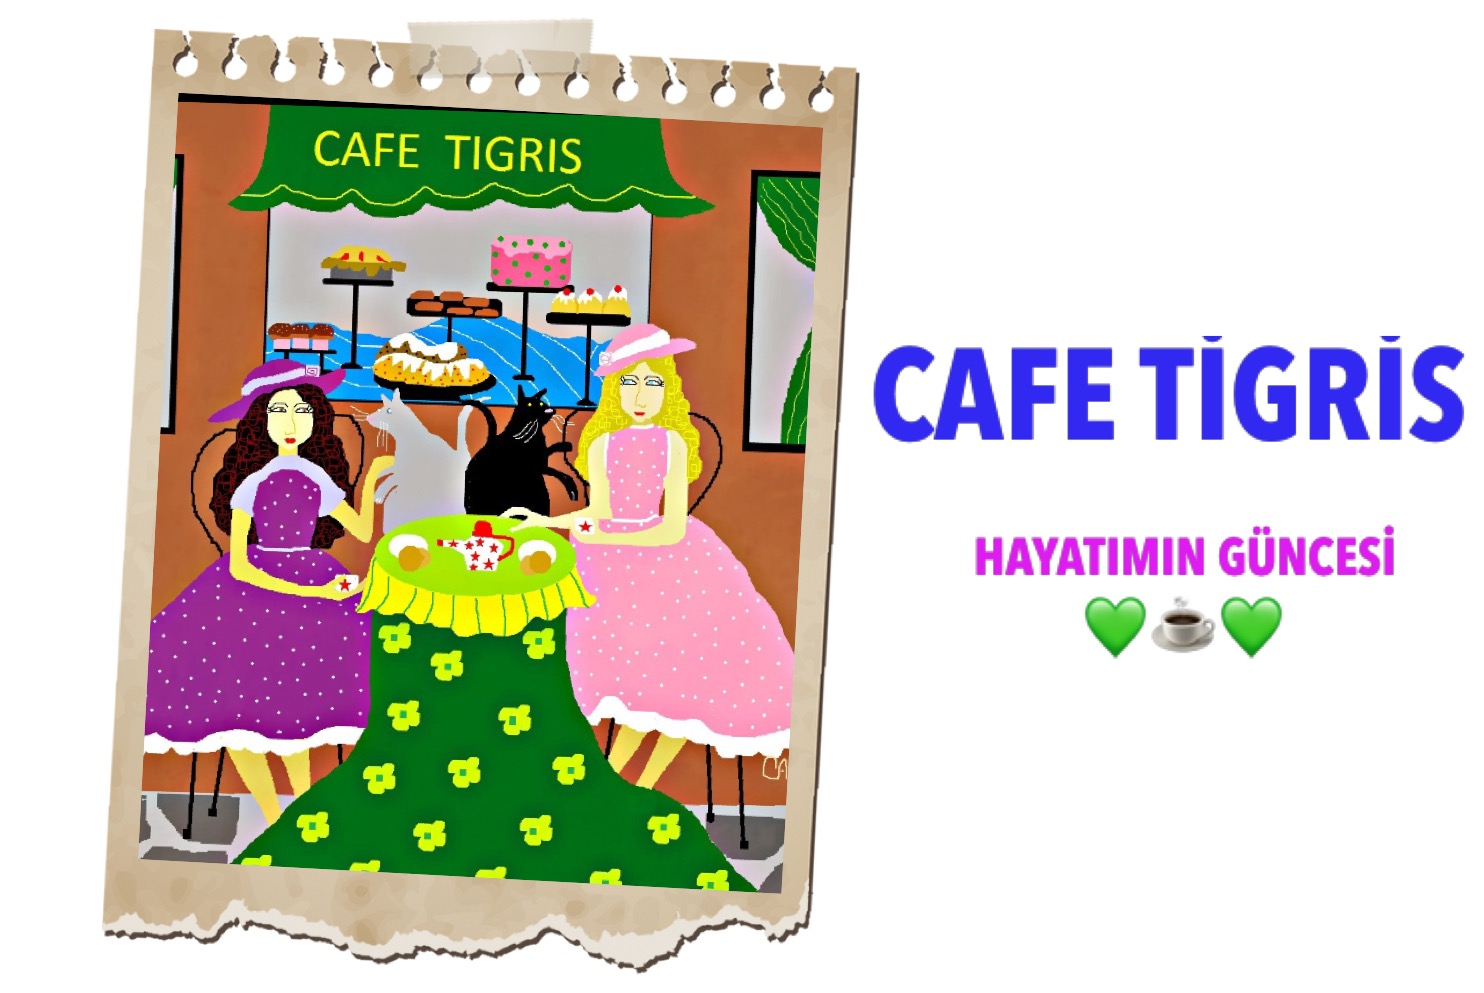 Cafe Tigris